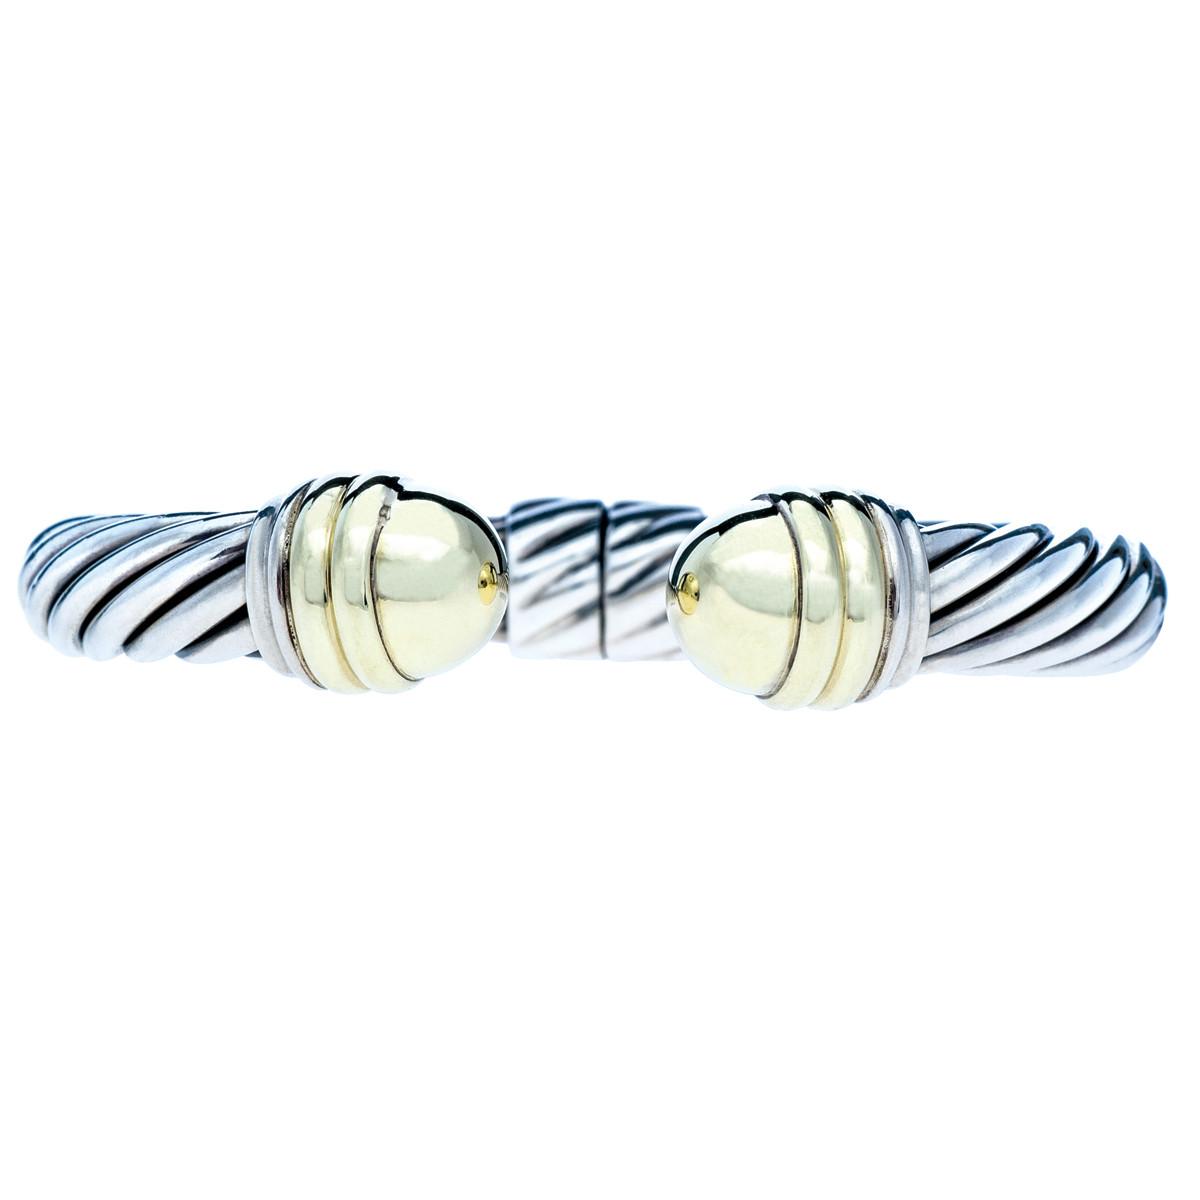 Vintage David Yurman Sterling Silver Cuff Bracelet